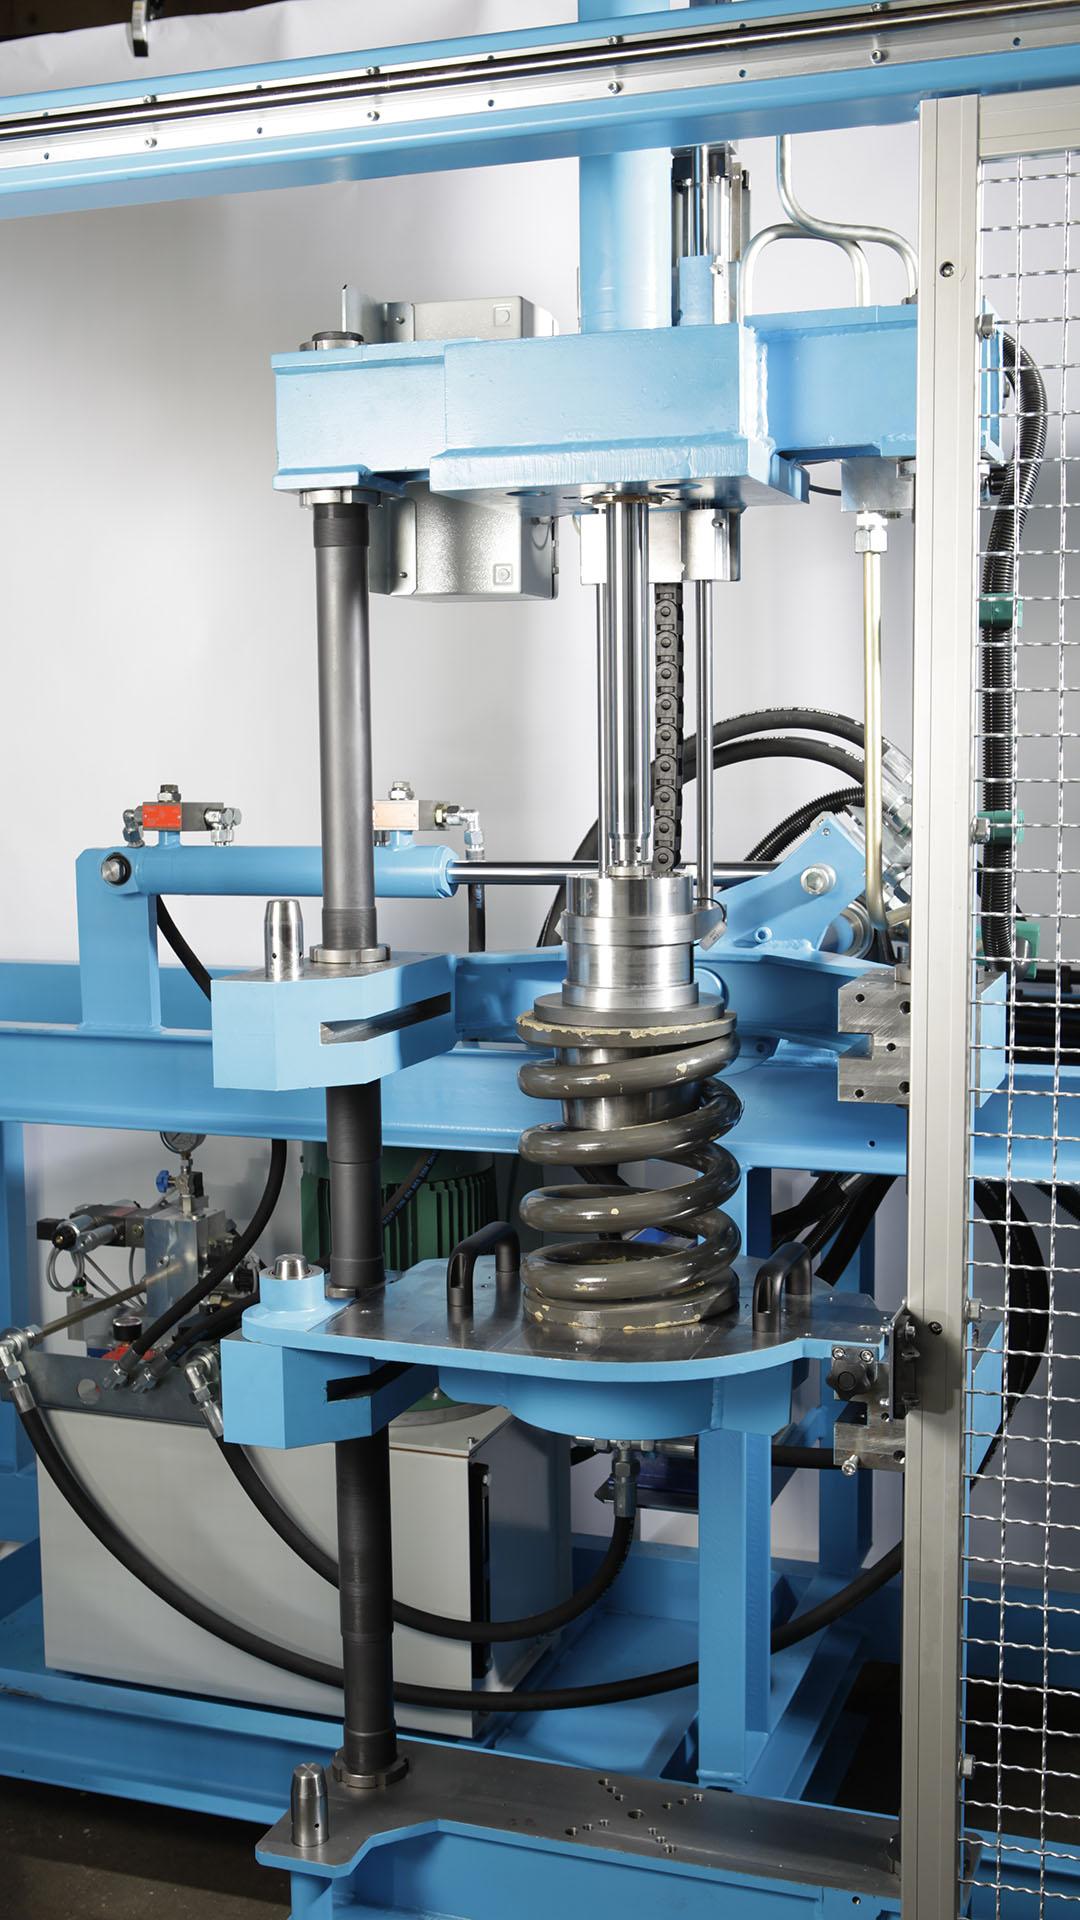 ulbrich-maschinenbau-kombi-stossdaempfer-federpruefmaschine